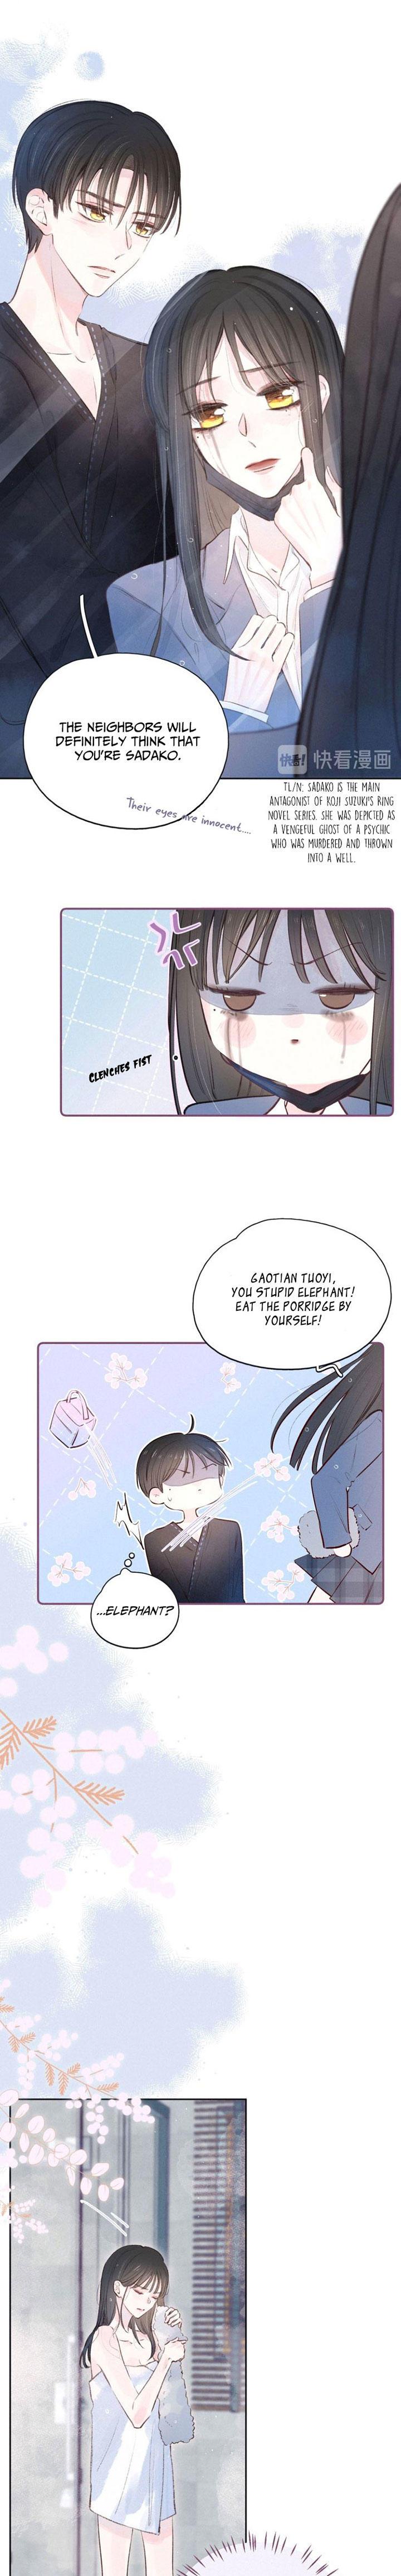 Hydrangea Melancholy Chapter 9 page 10 - Mangakakalots.com